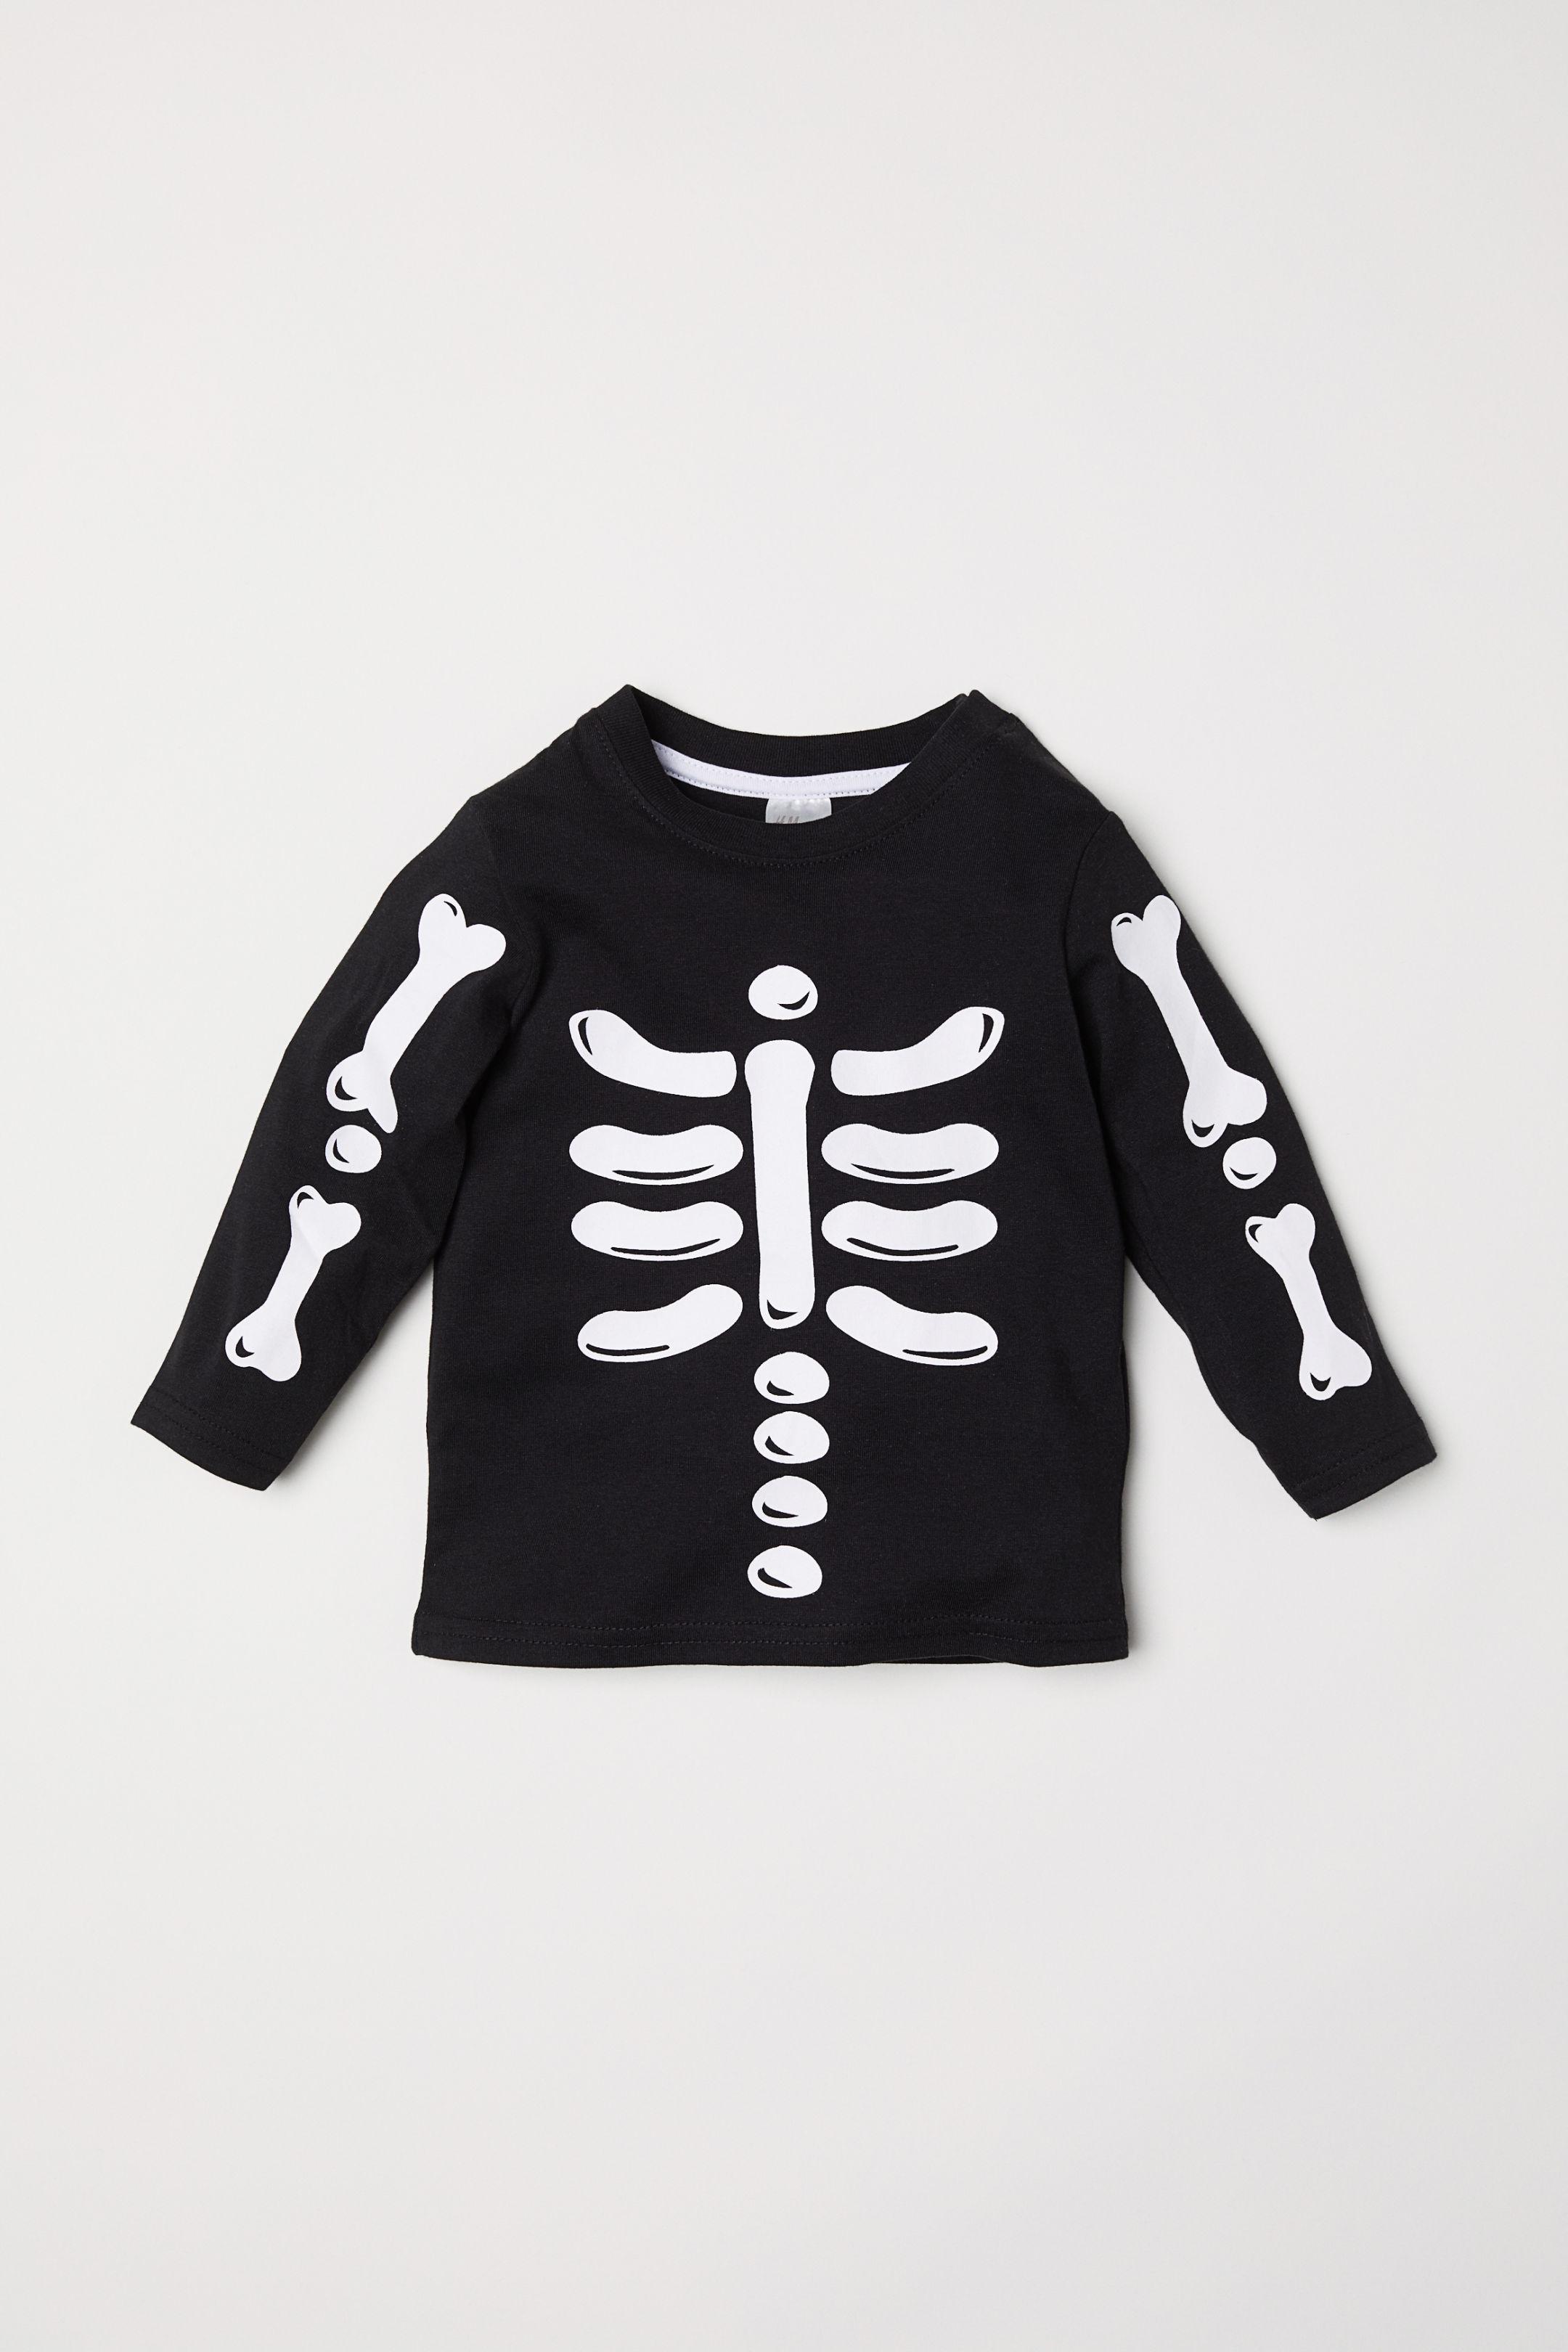 skeleton-baby-top